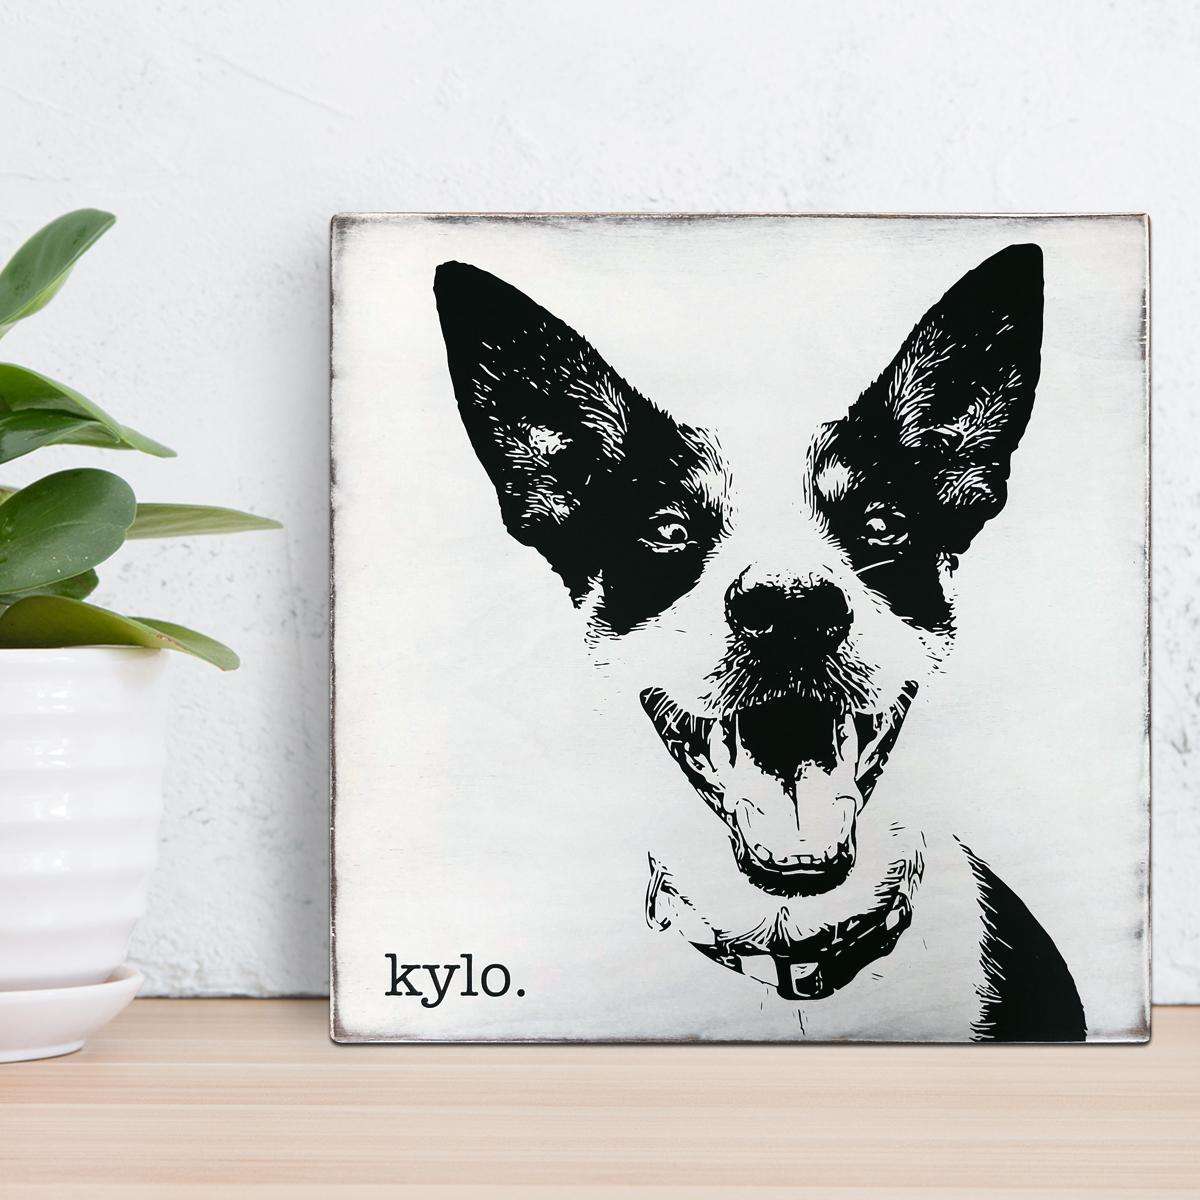 KyloPortrait.jpg